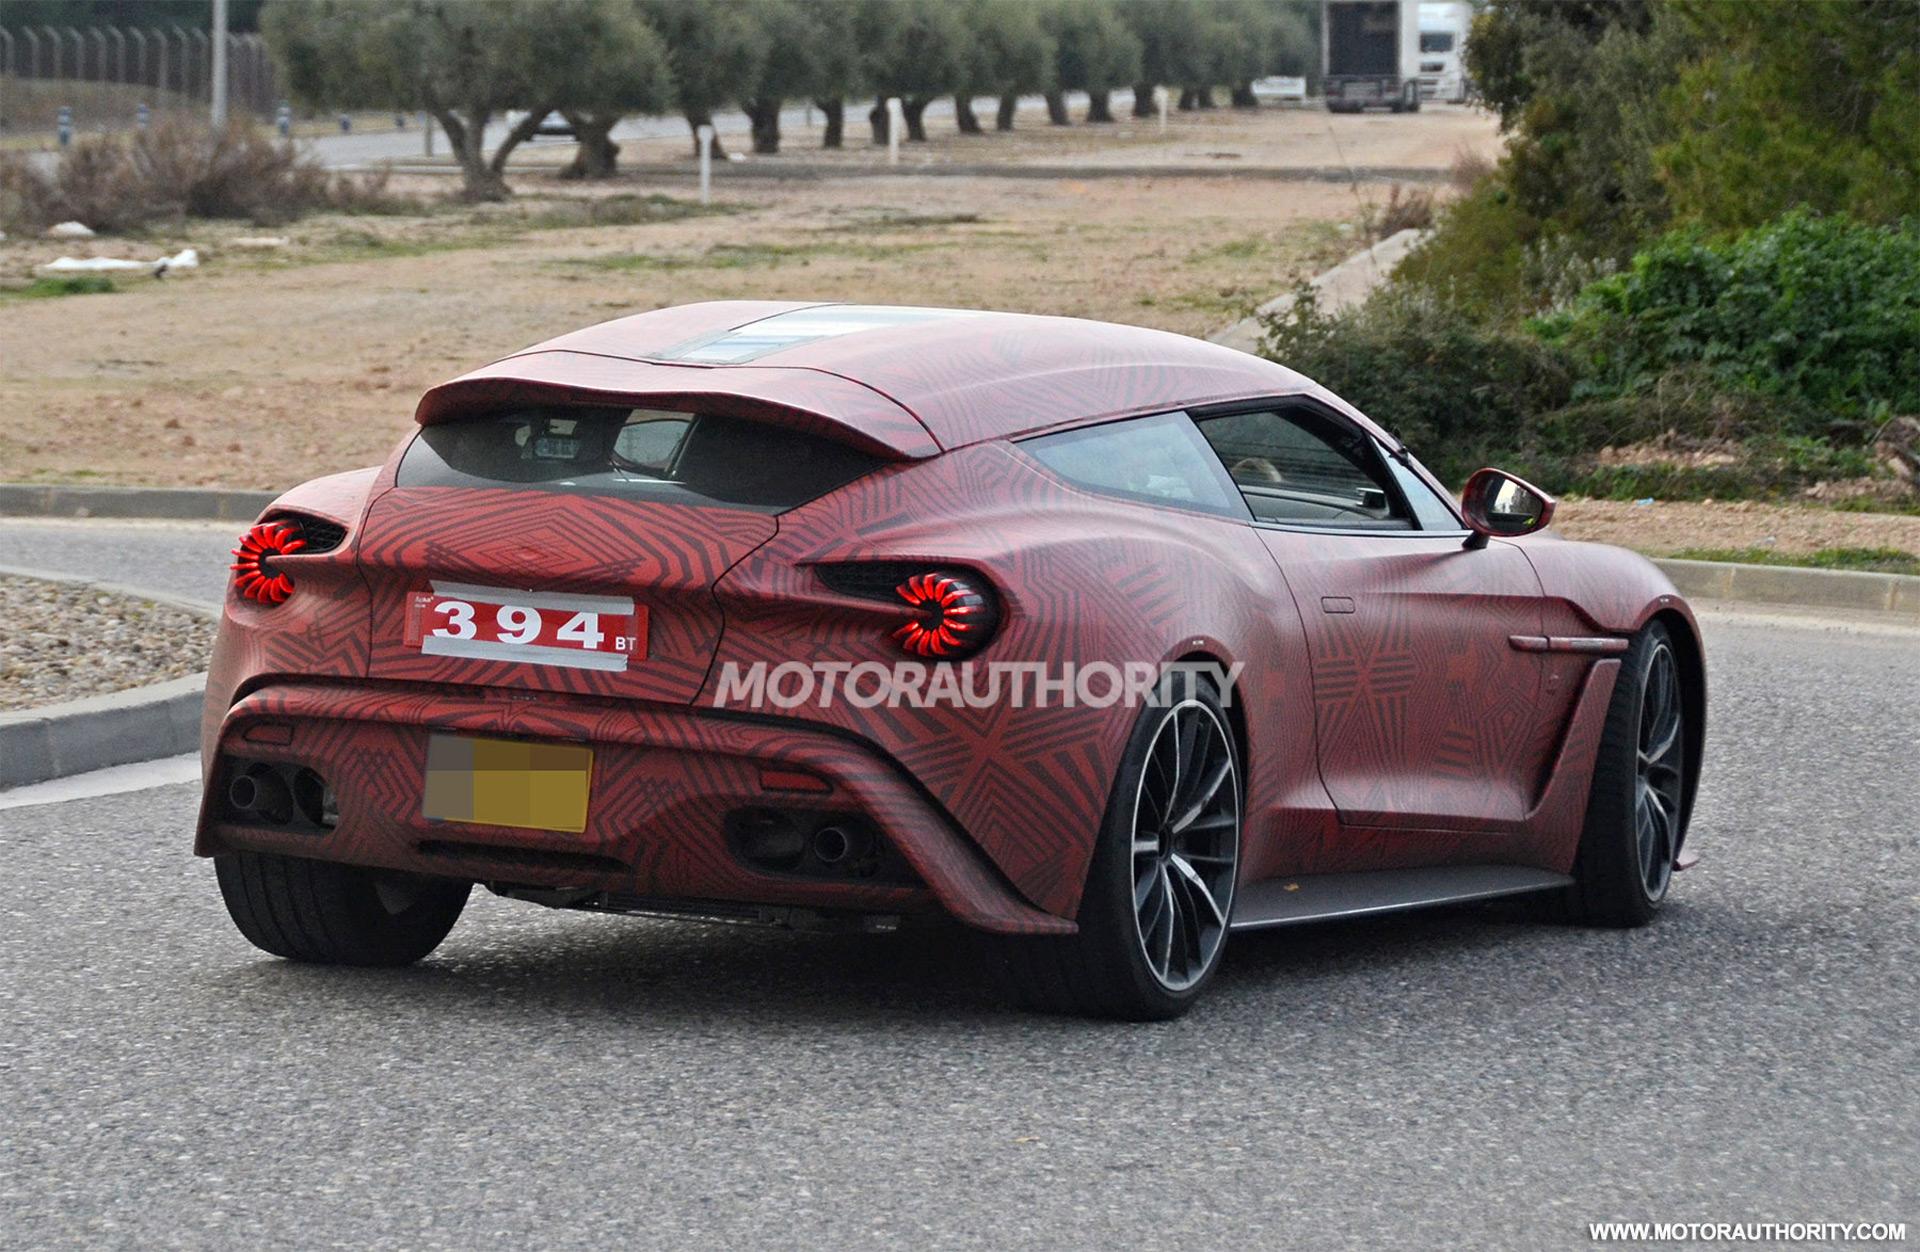 2012 - [Aston Martin] Vanquish [310] - Page 11 Aston-martin-vanquish-zagato-shooting-brake-spy-shots--image-via-s-baldauf-sb-medien_100684628_h